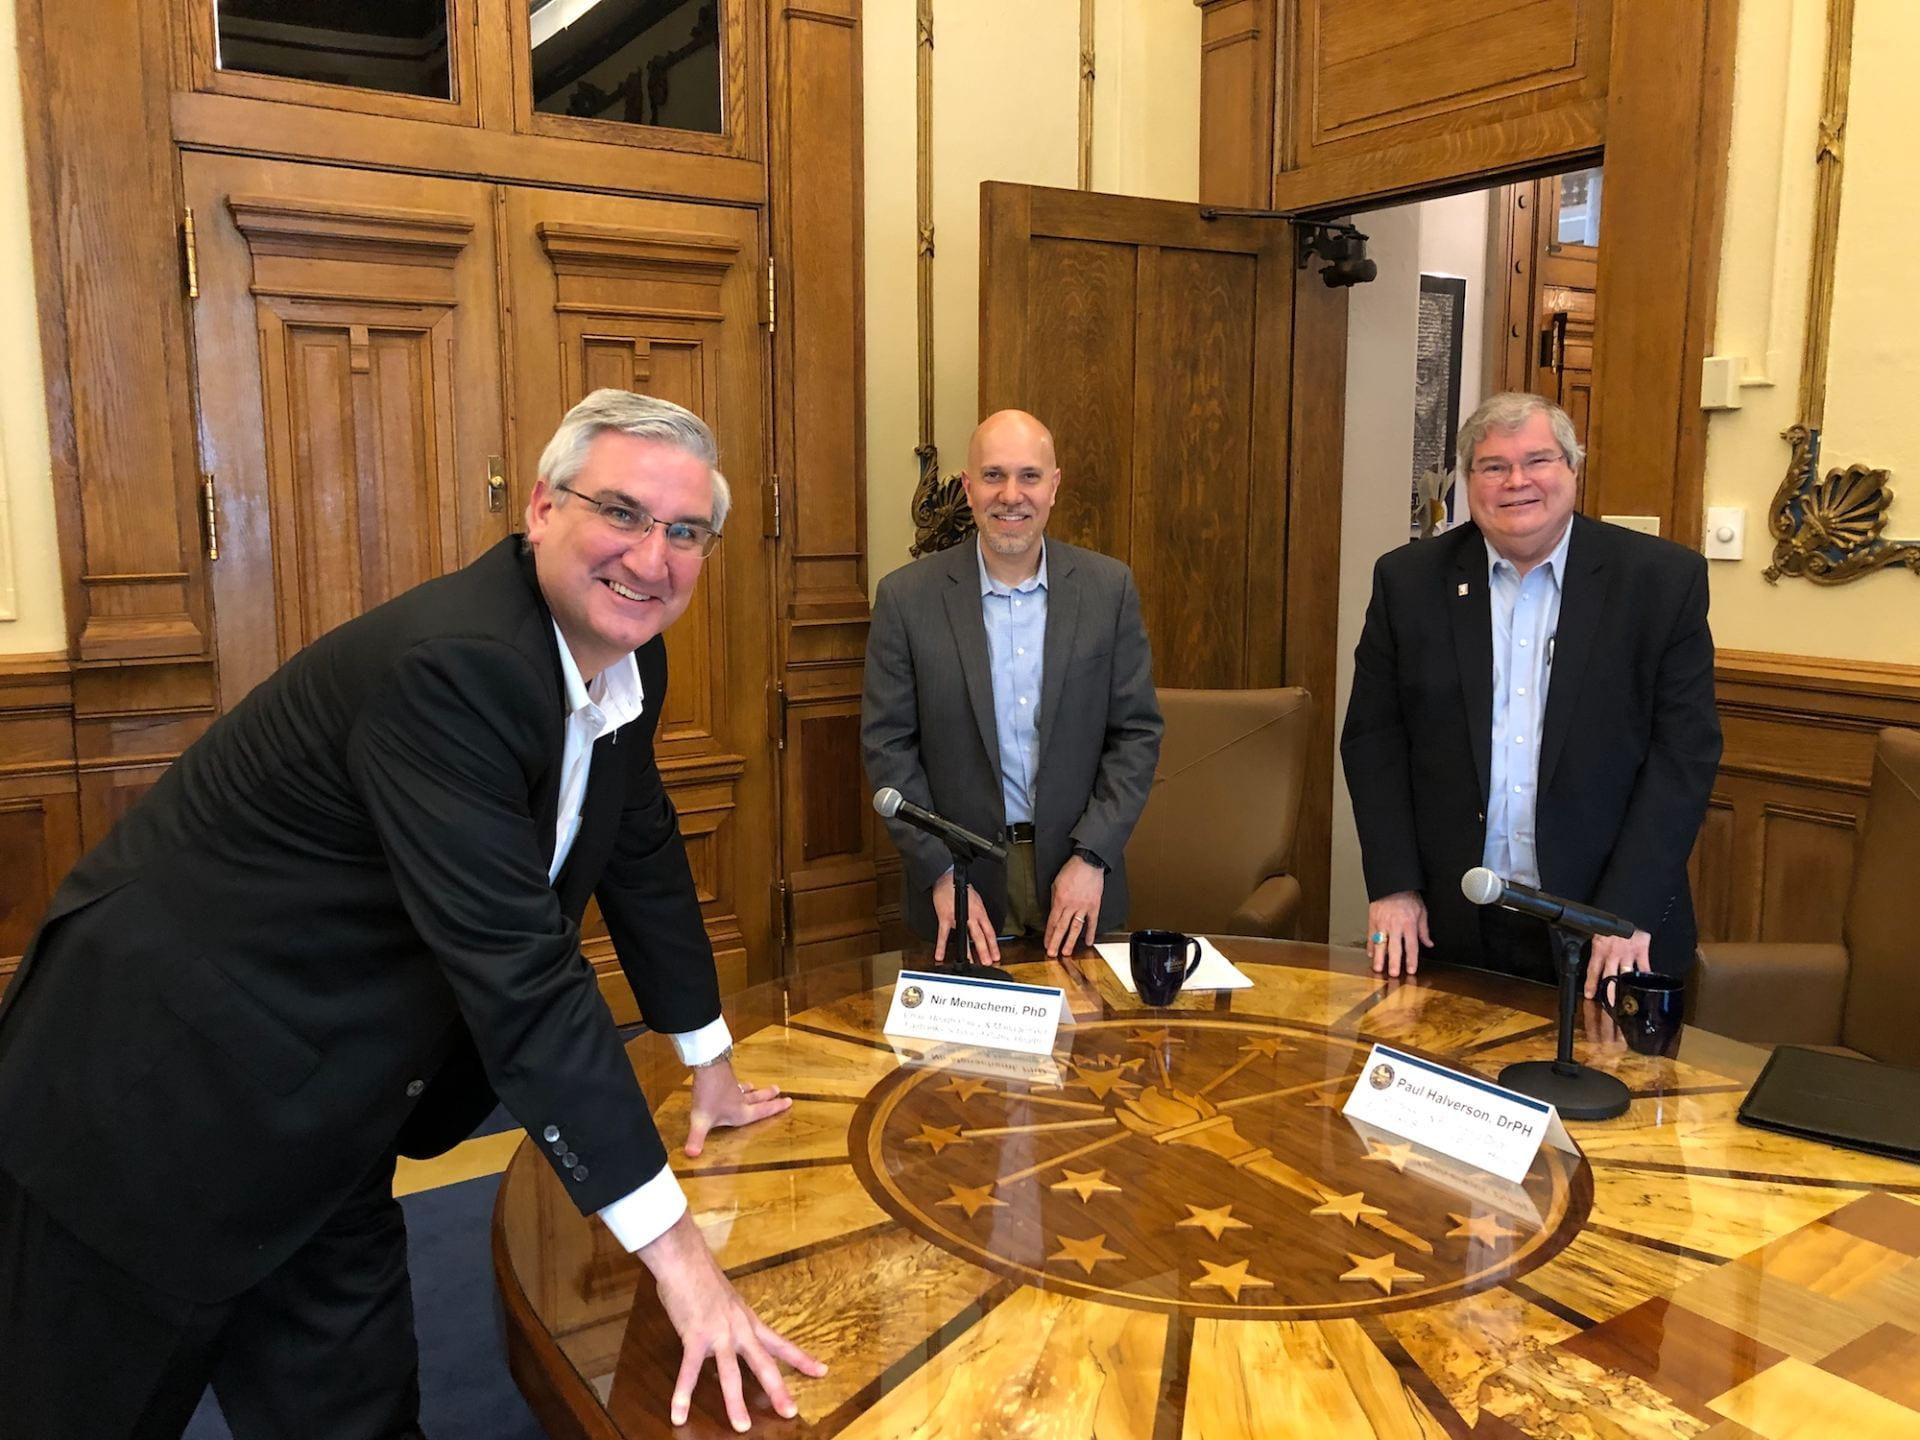 Dean Halverson, Dr. Nir Menachem and Gov. Eric Holcomb gather around board table.